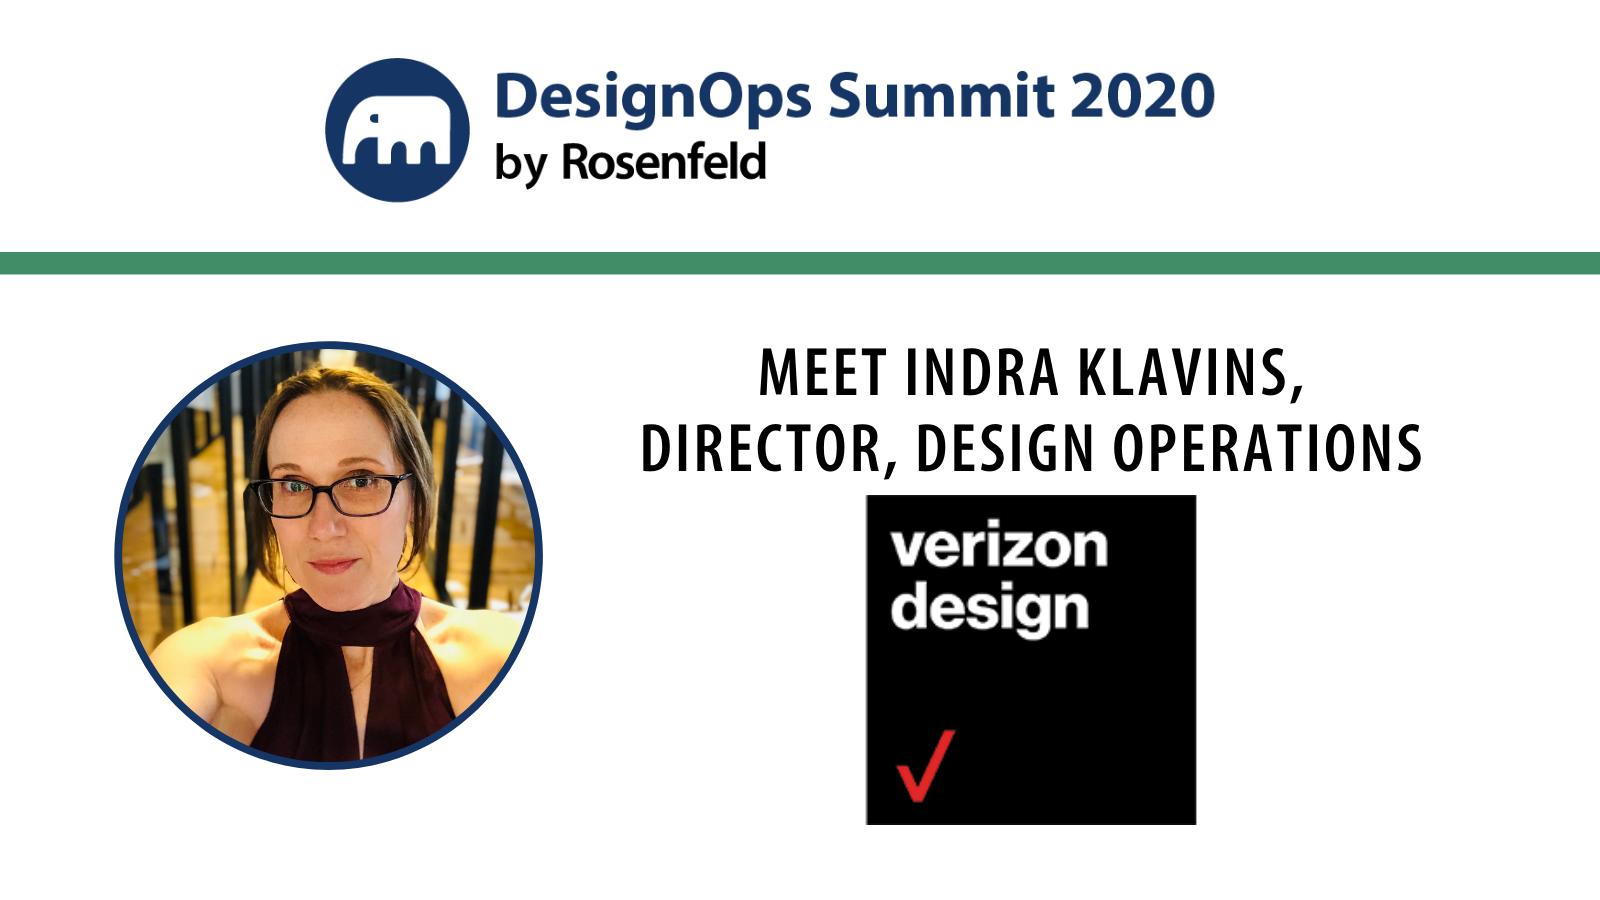 Meet Indra Klavins, Director, Design Operations at Verizon